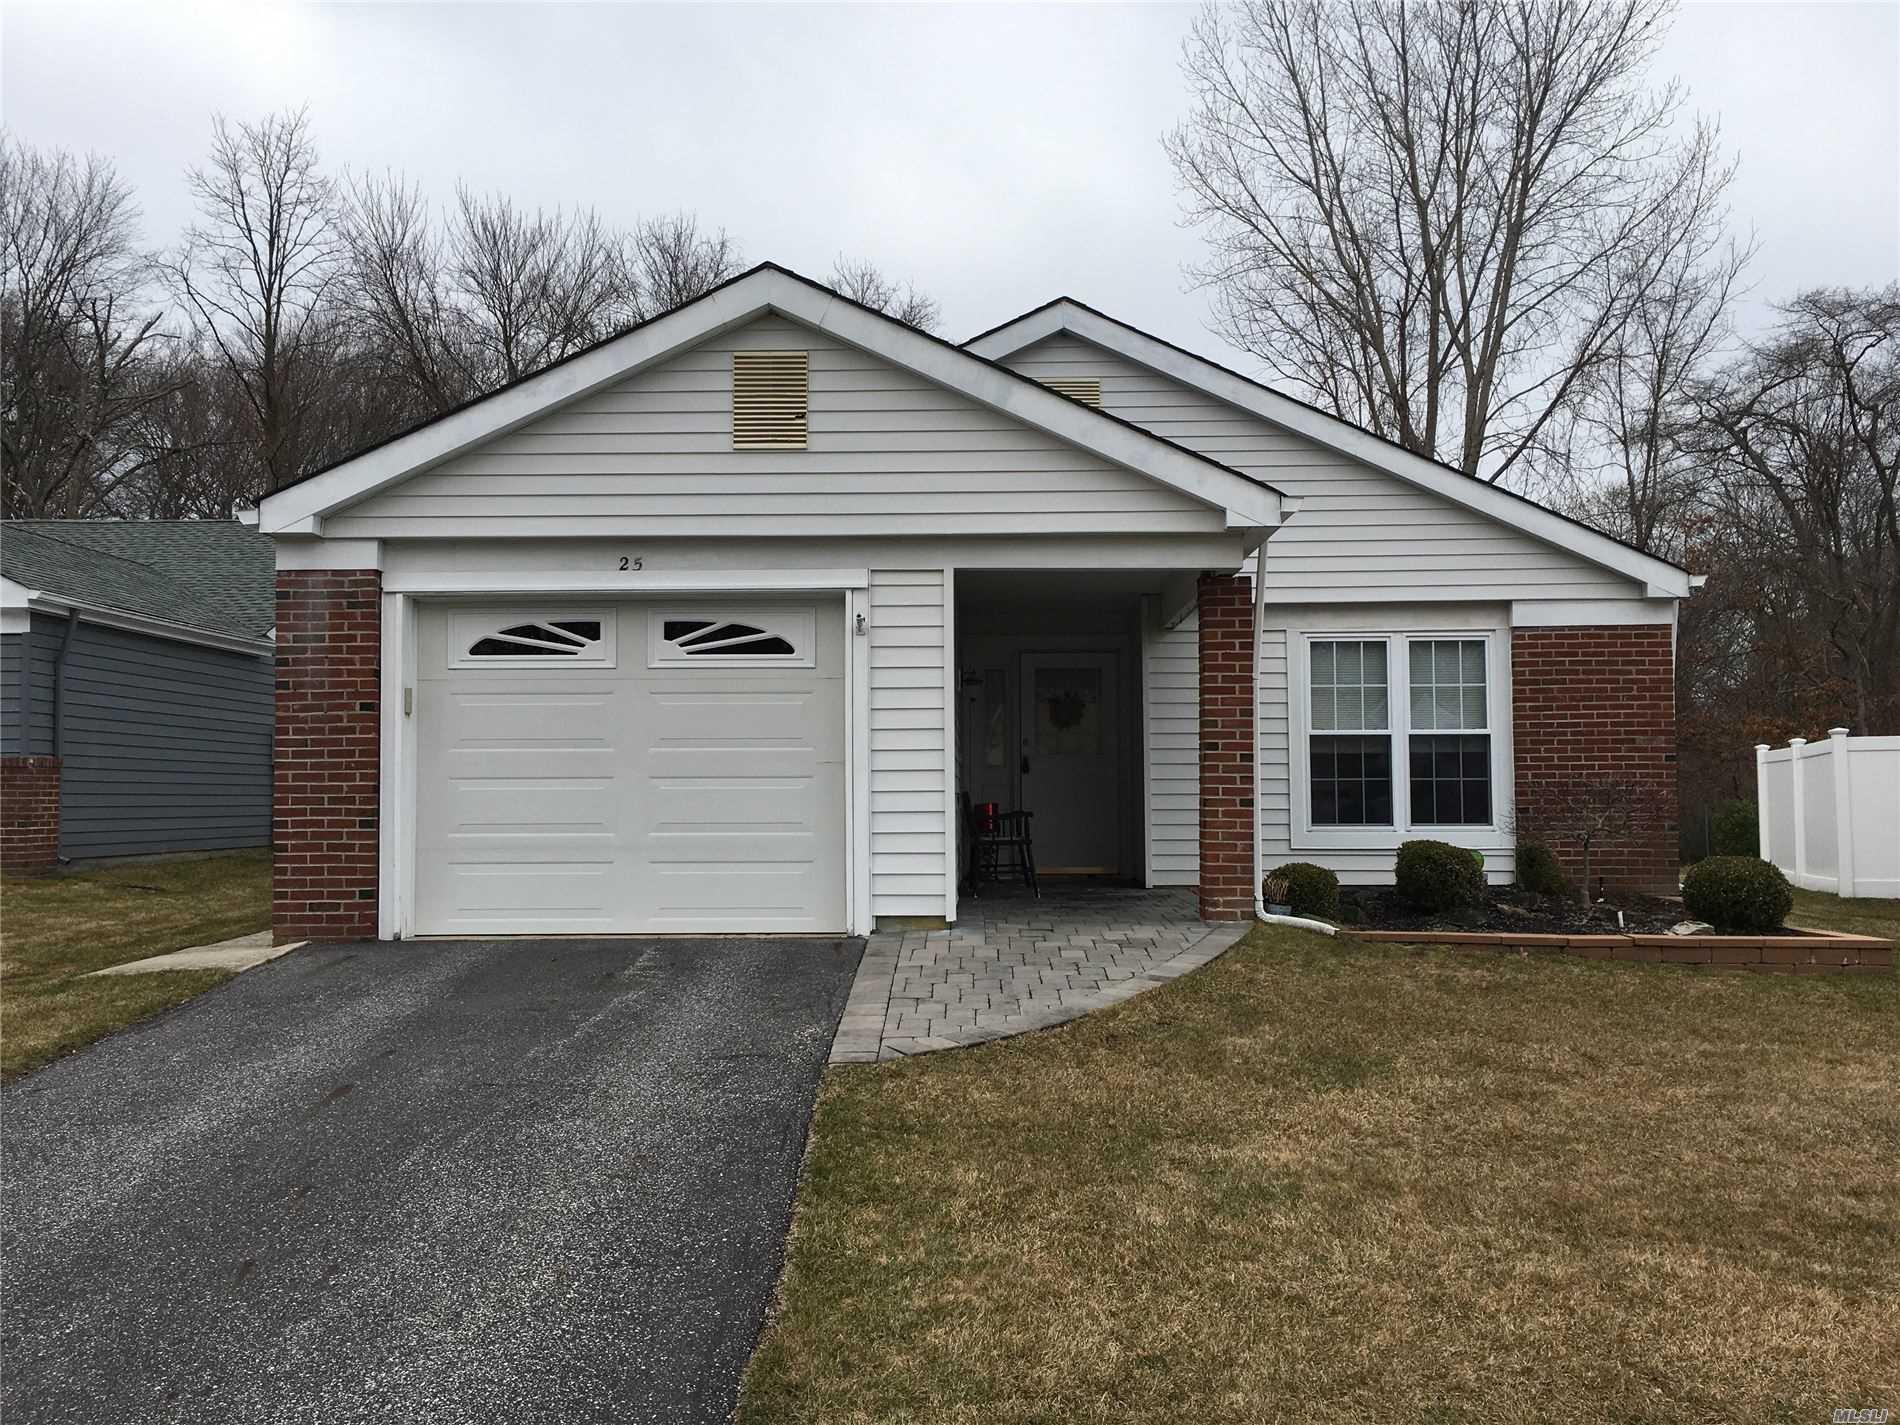 Property for sale at 25 Lamont Road, Ridge NY 11961, Ridge,  New York 11961